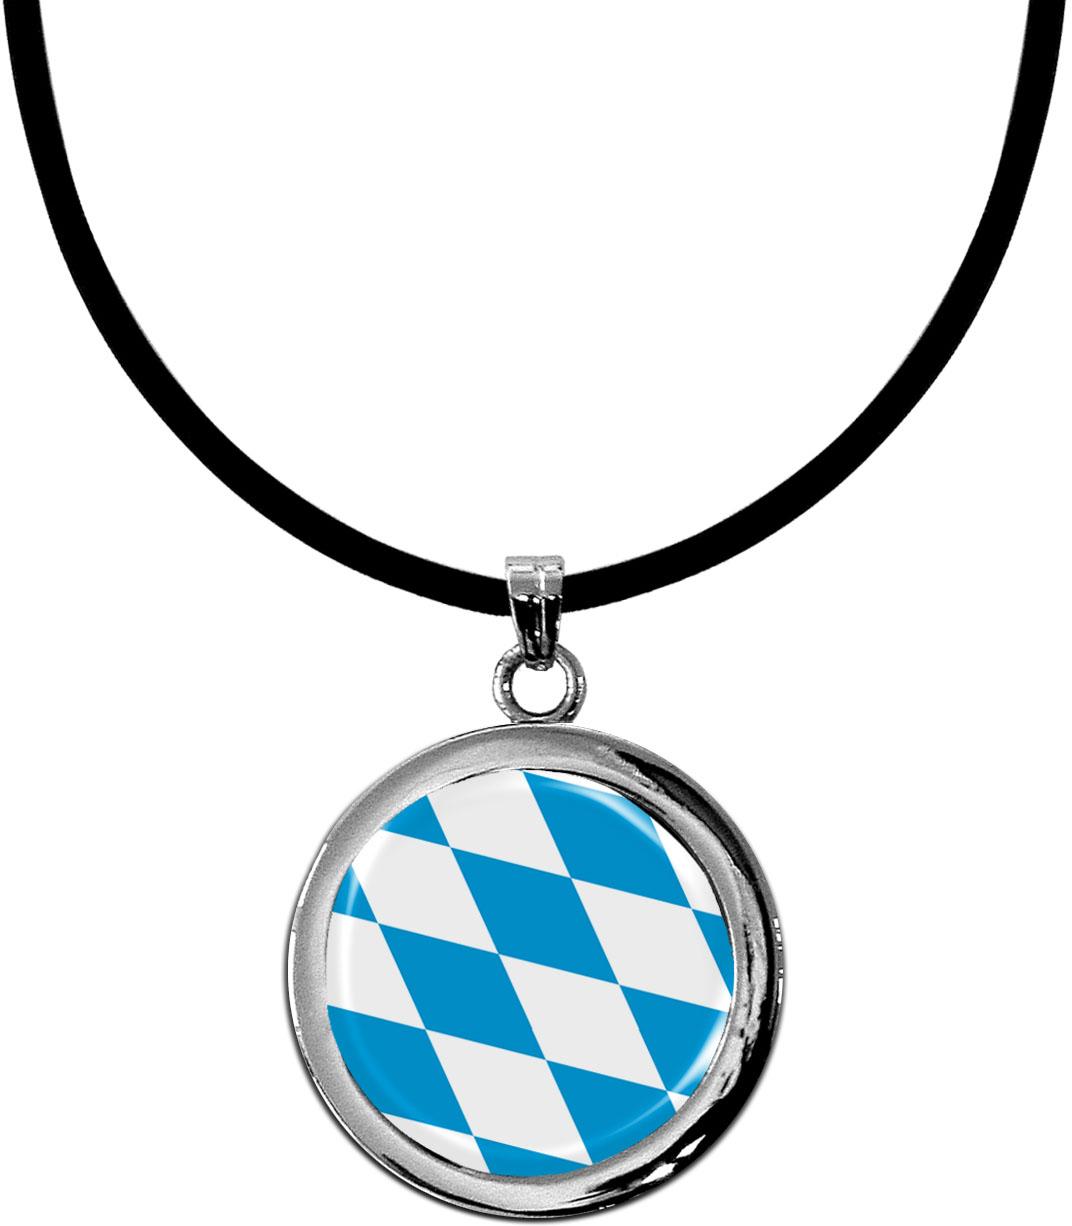 Kettenanhänger / Bayern / Silikonband mit Silberverschluss